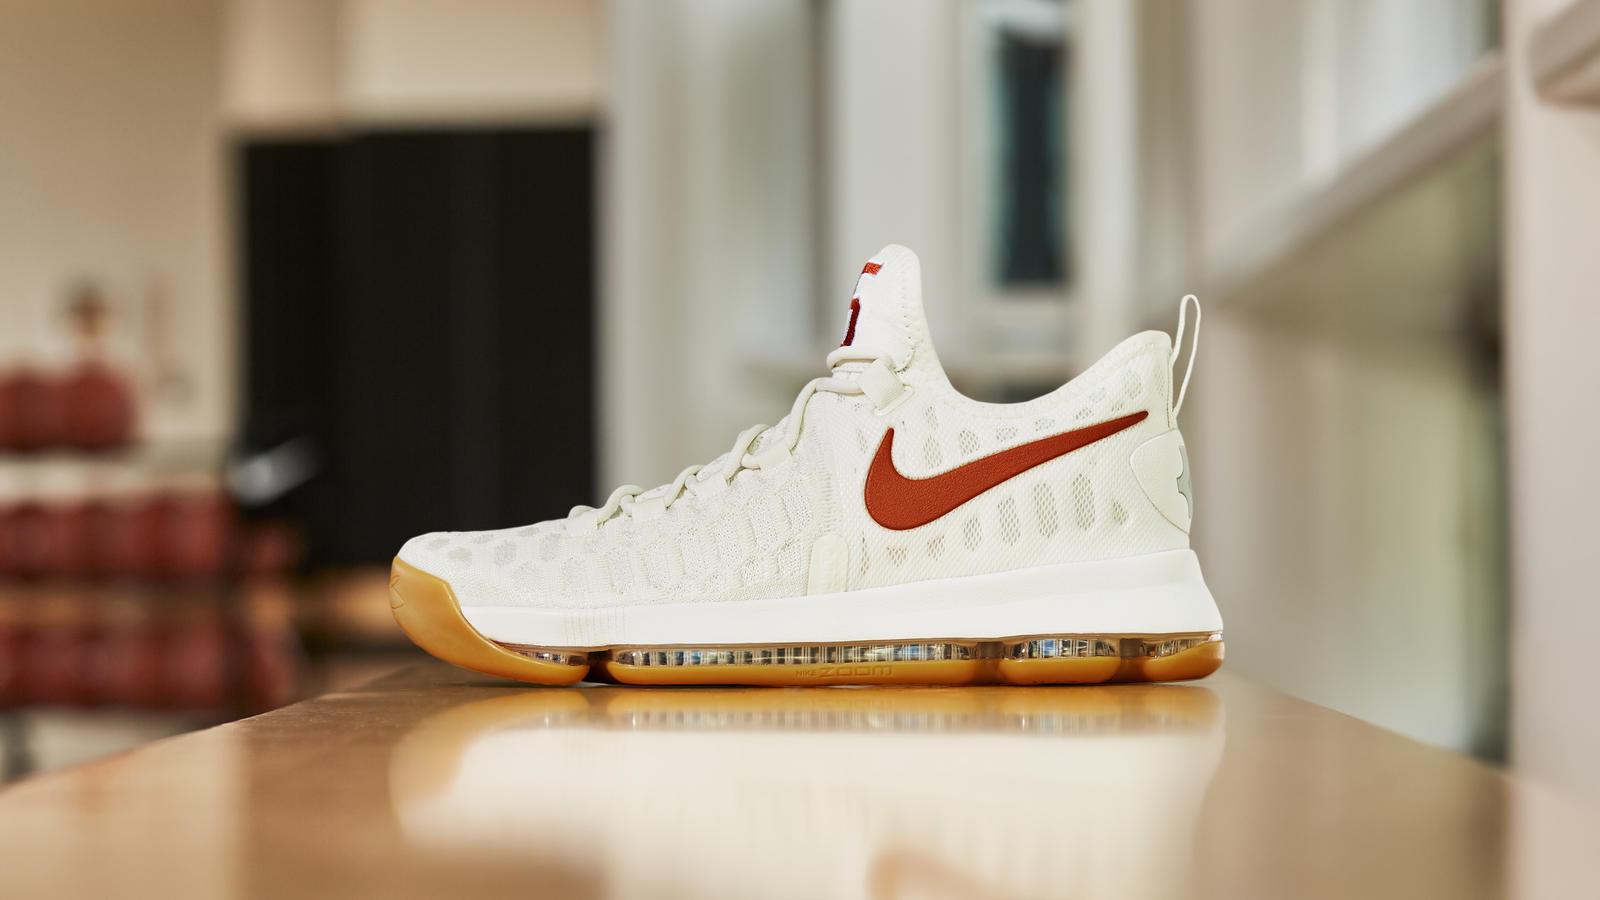 promo code f4791 09059 Nike Zoom KD 9 'Texas' - WearTesters